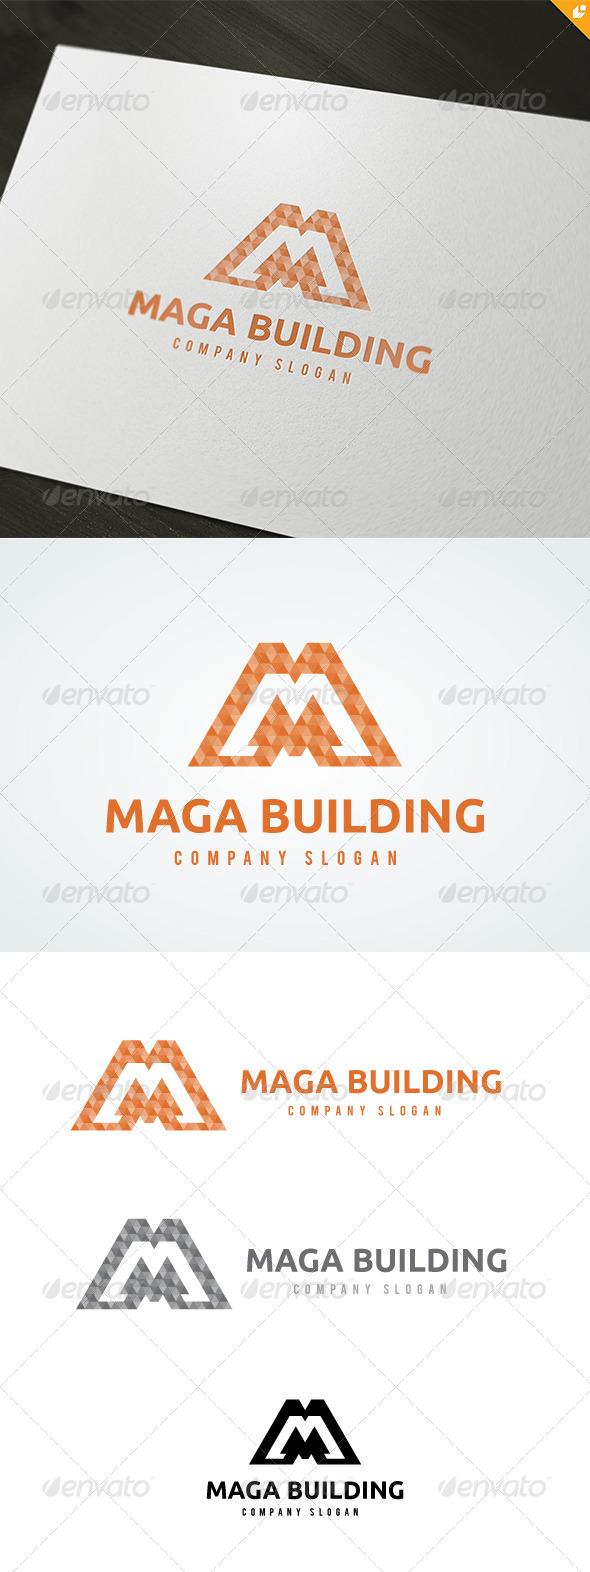 GraphicRiver Maga Building Logo 4711337